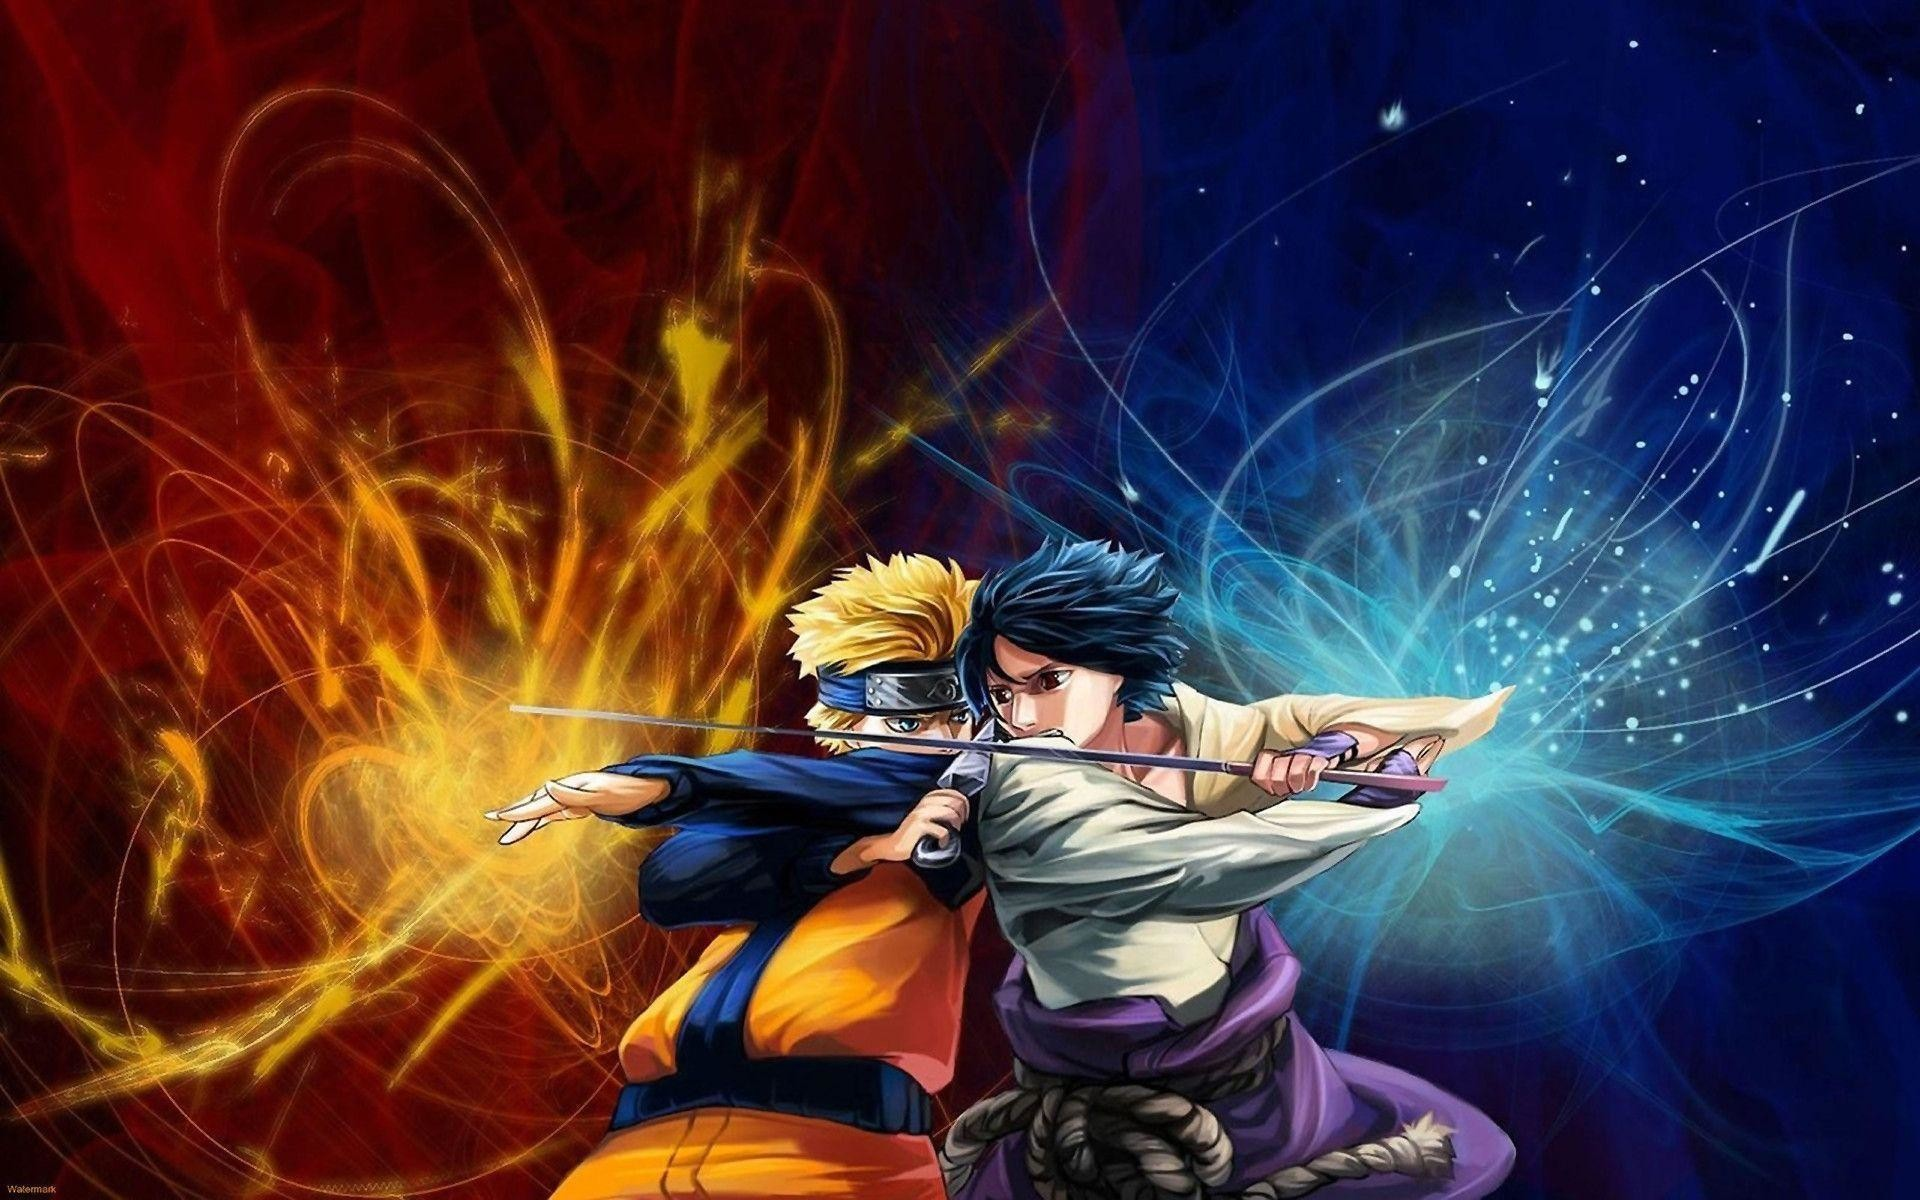 Naruto And Sasuke Wallpaper ①